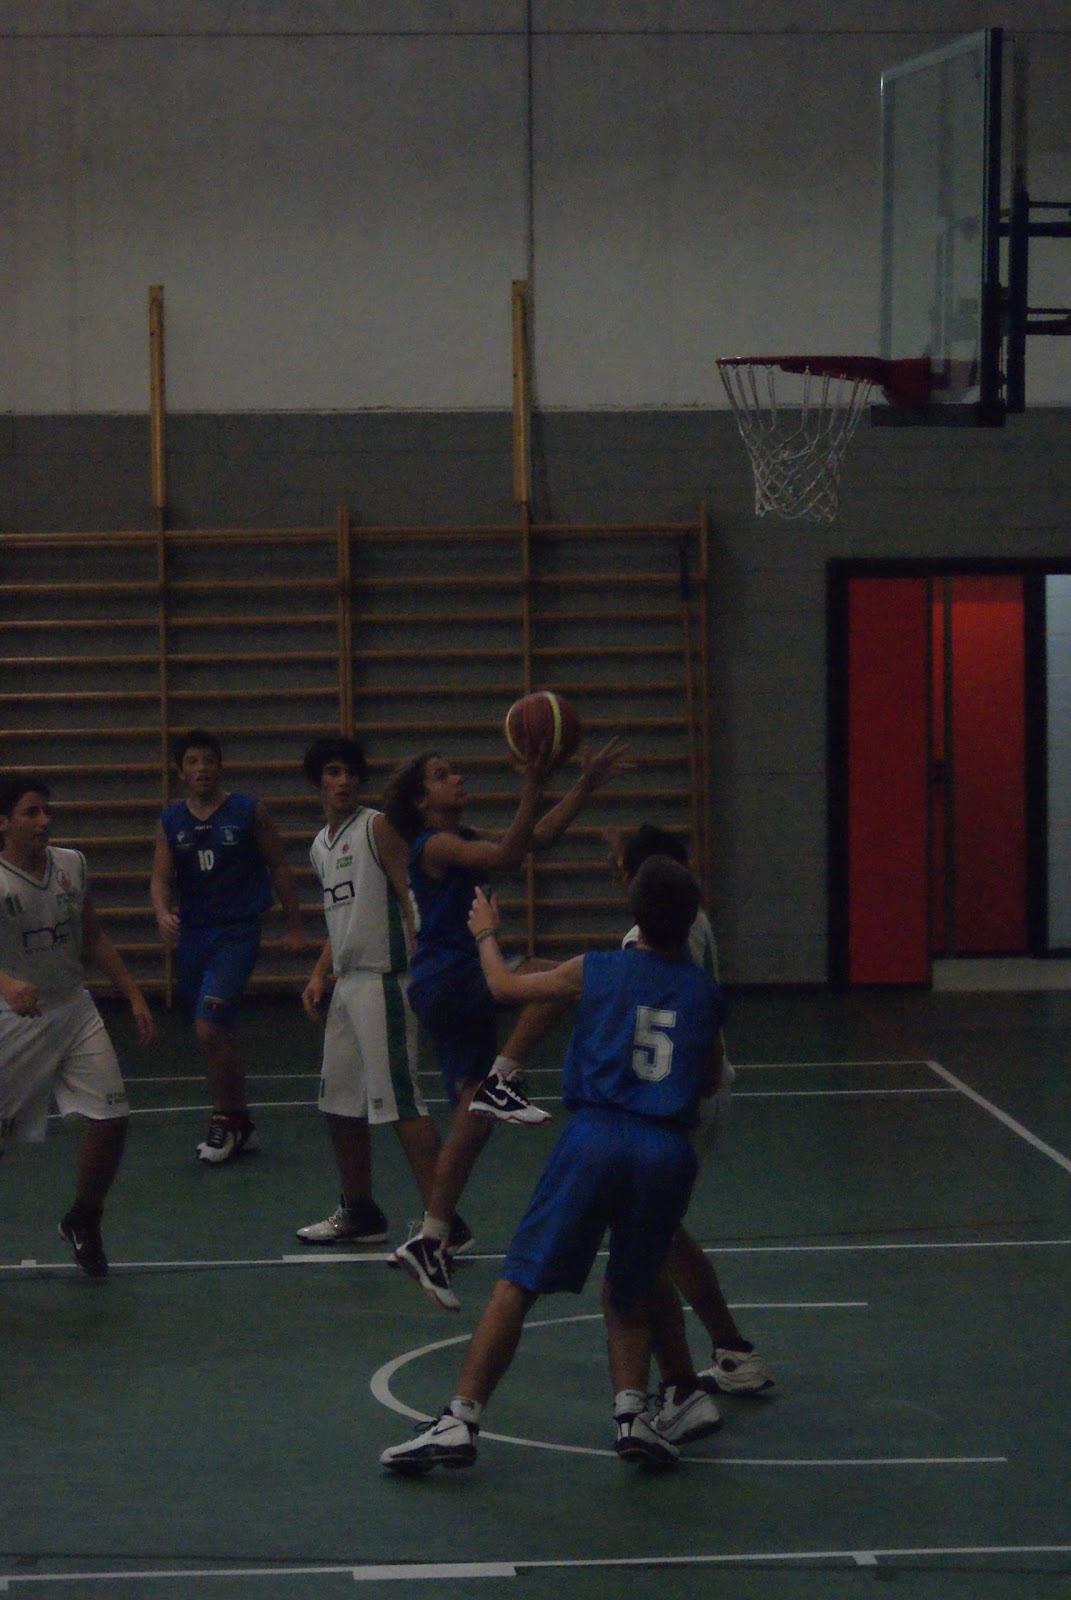 Scuola Media Vergani Novate Milanese.Polisportiva Novate Basket Minibasket 2010